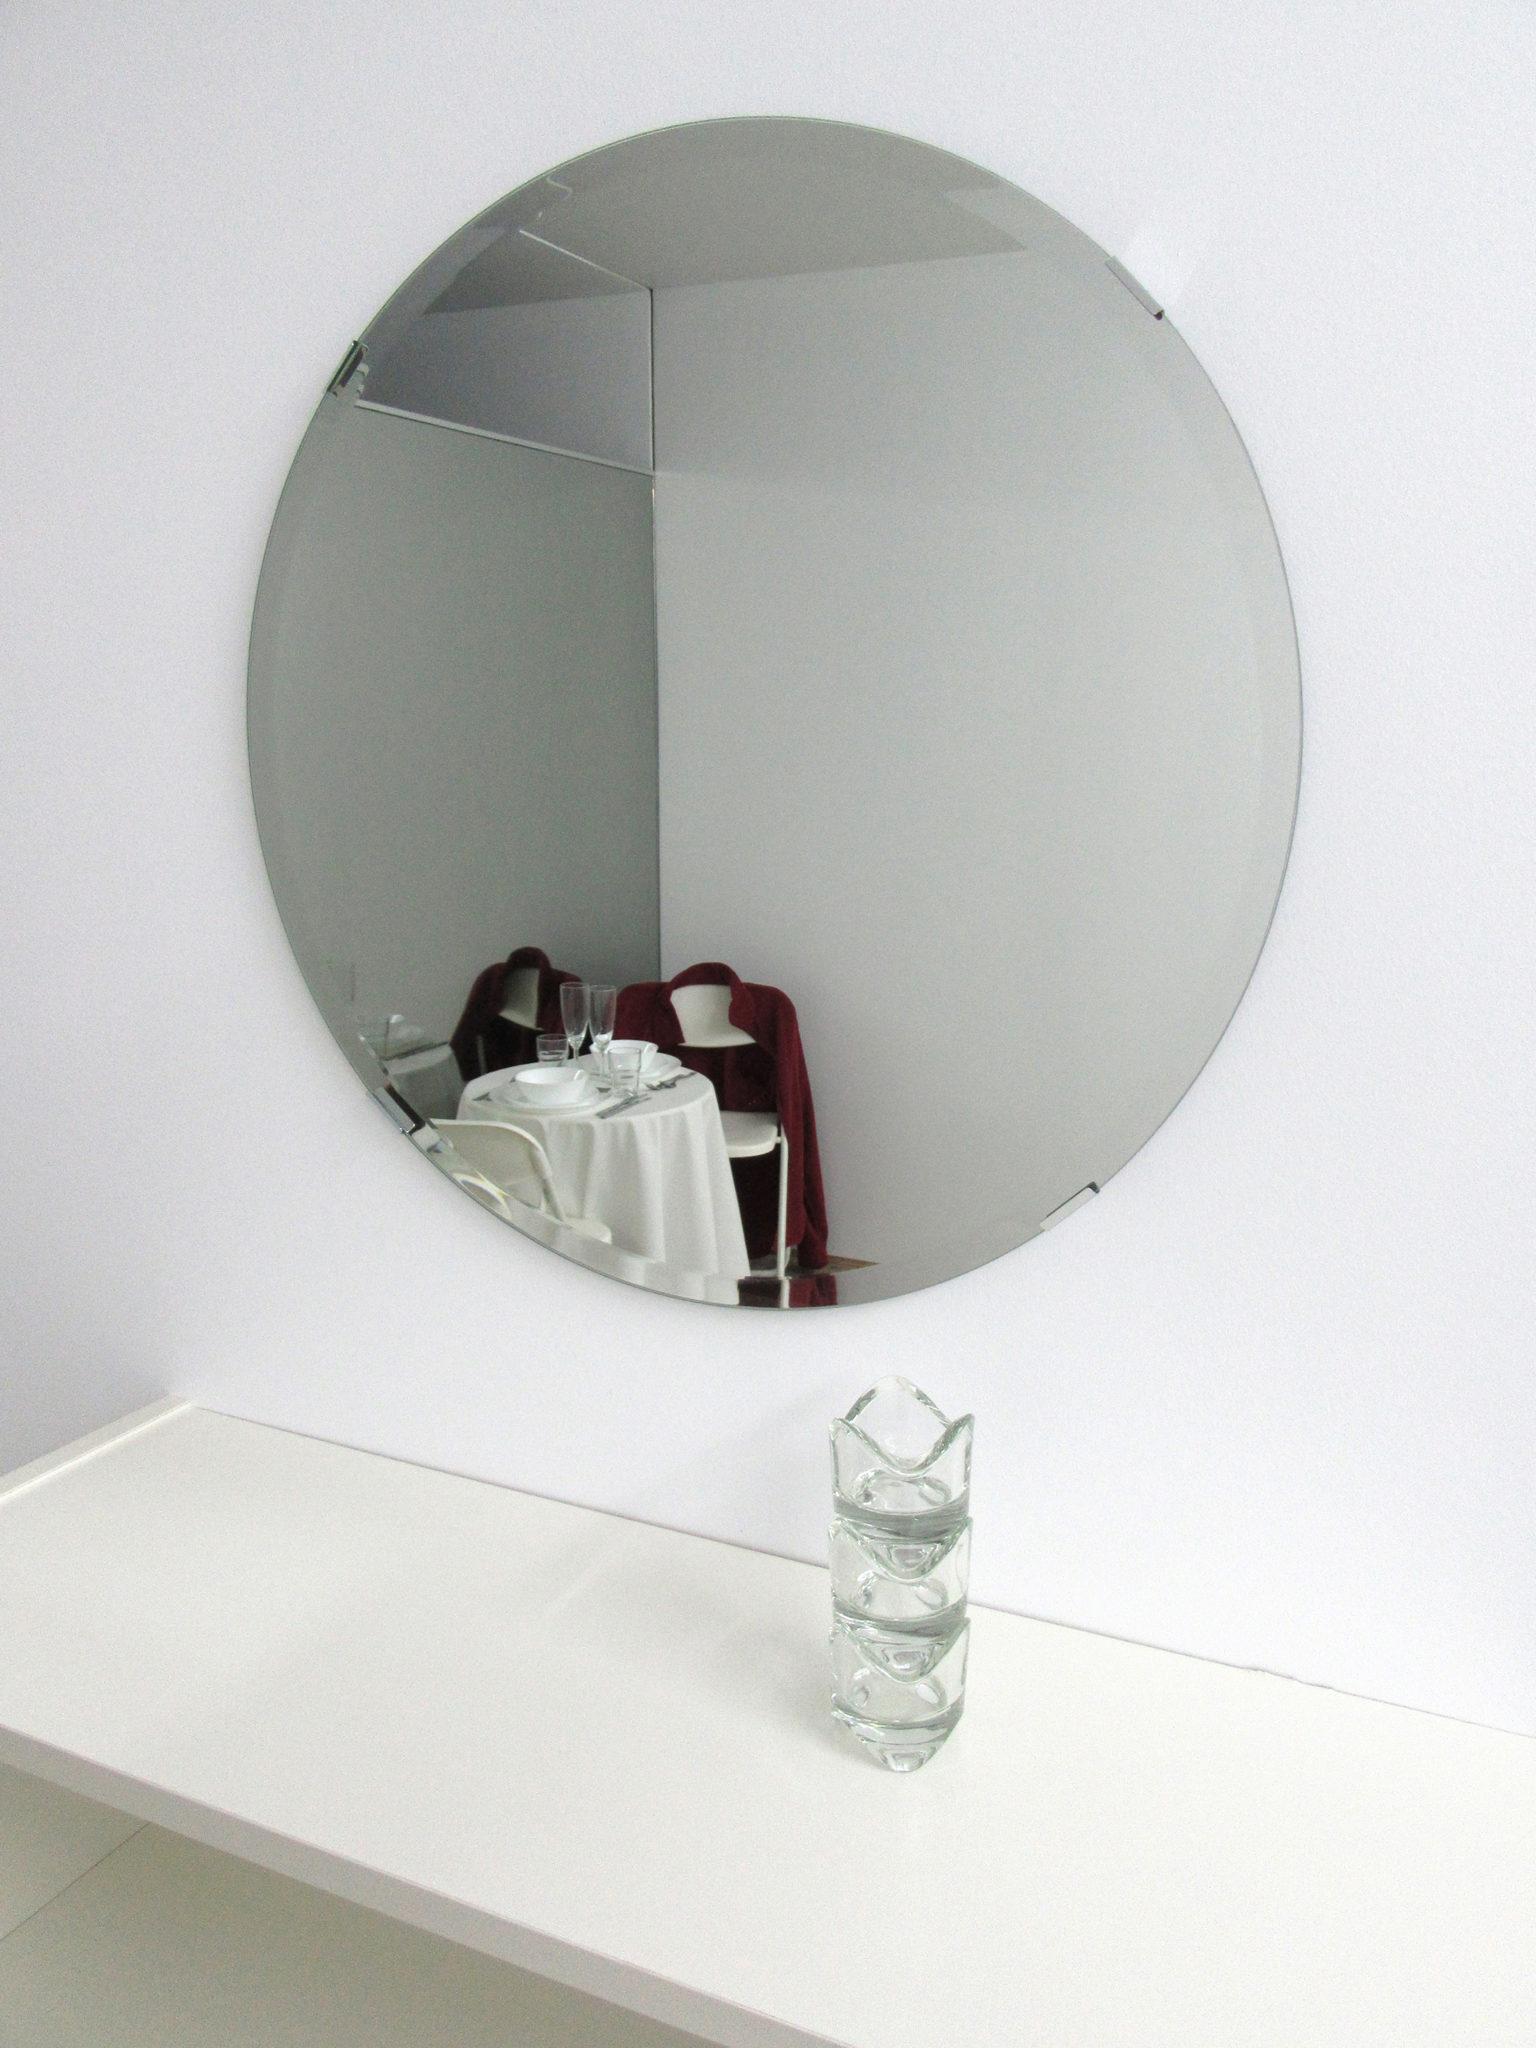 sannahelenaberger-theedgemustbescalloped-diorama-19